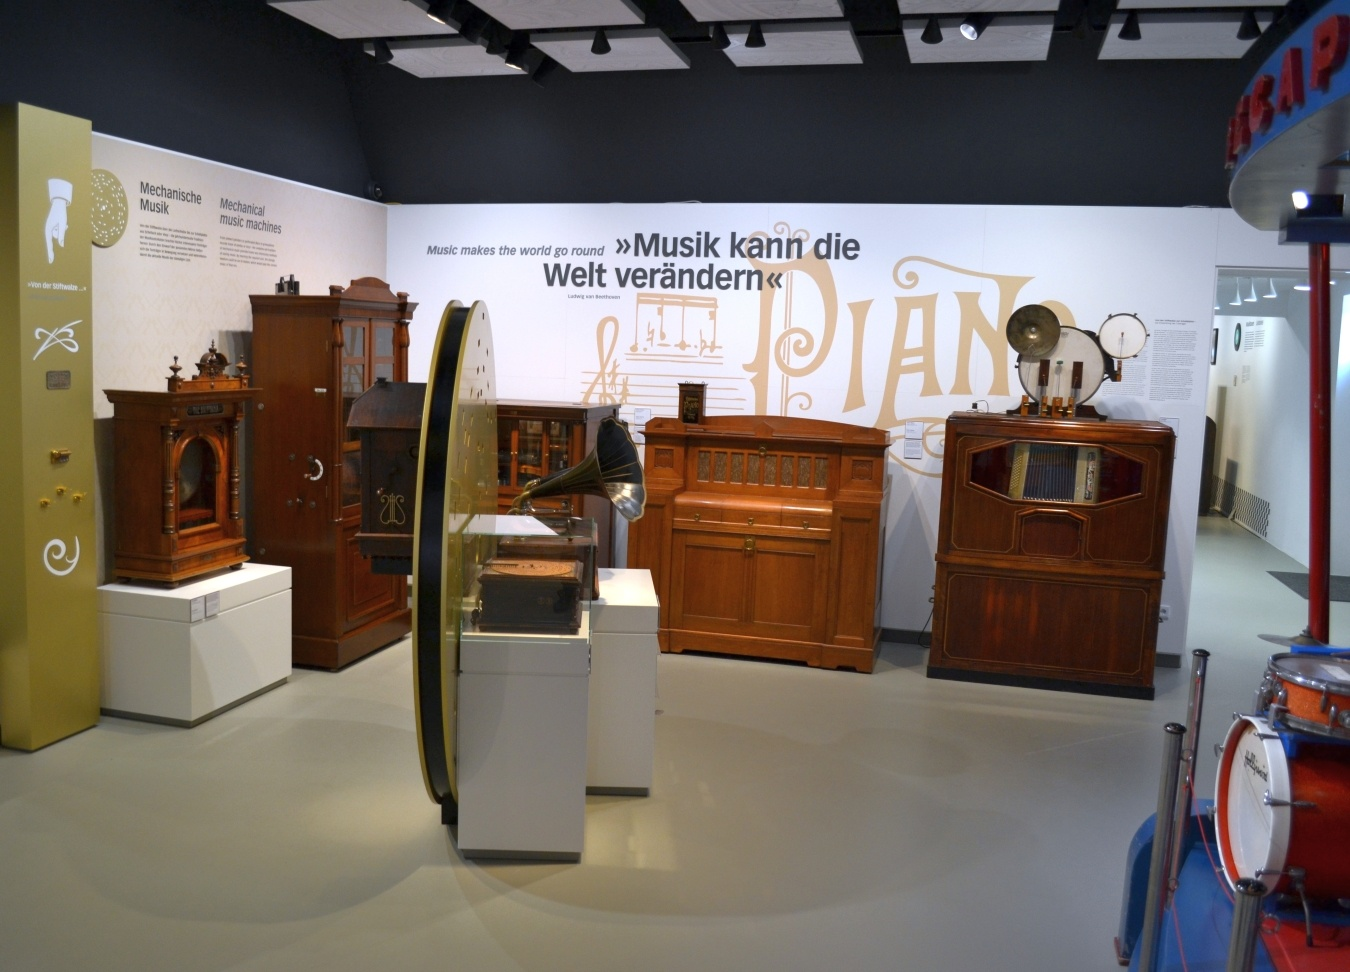 Deutsches Automatenmuseum Espelkamp - mechanische Musik